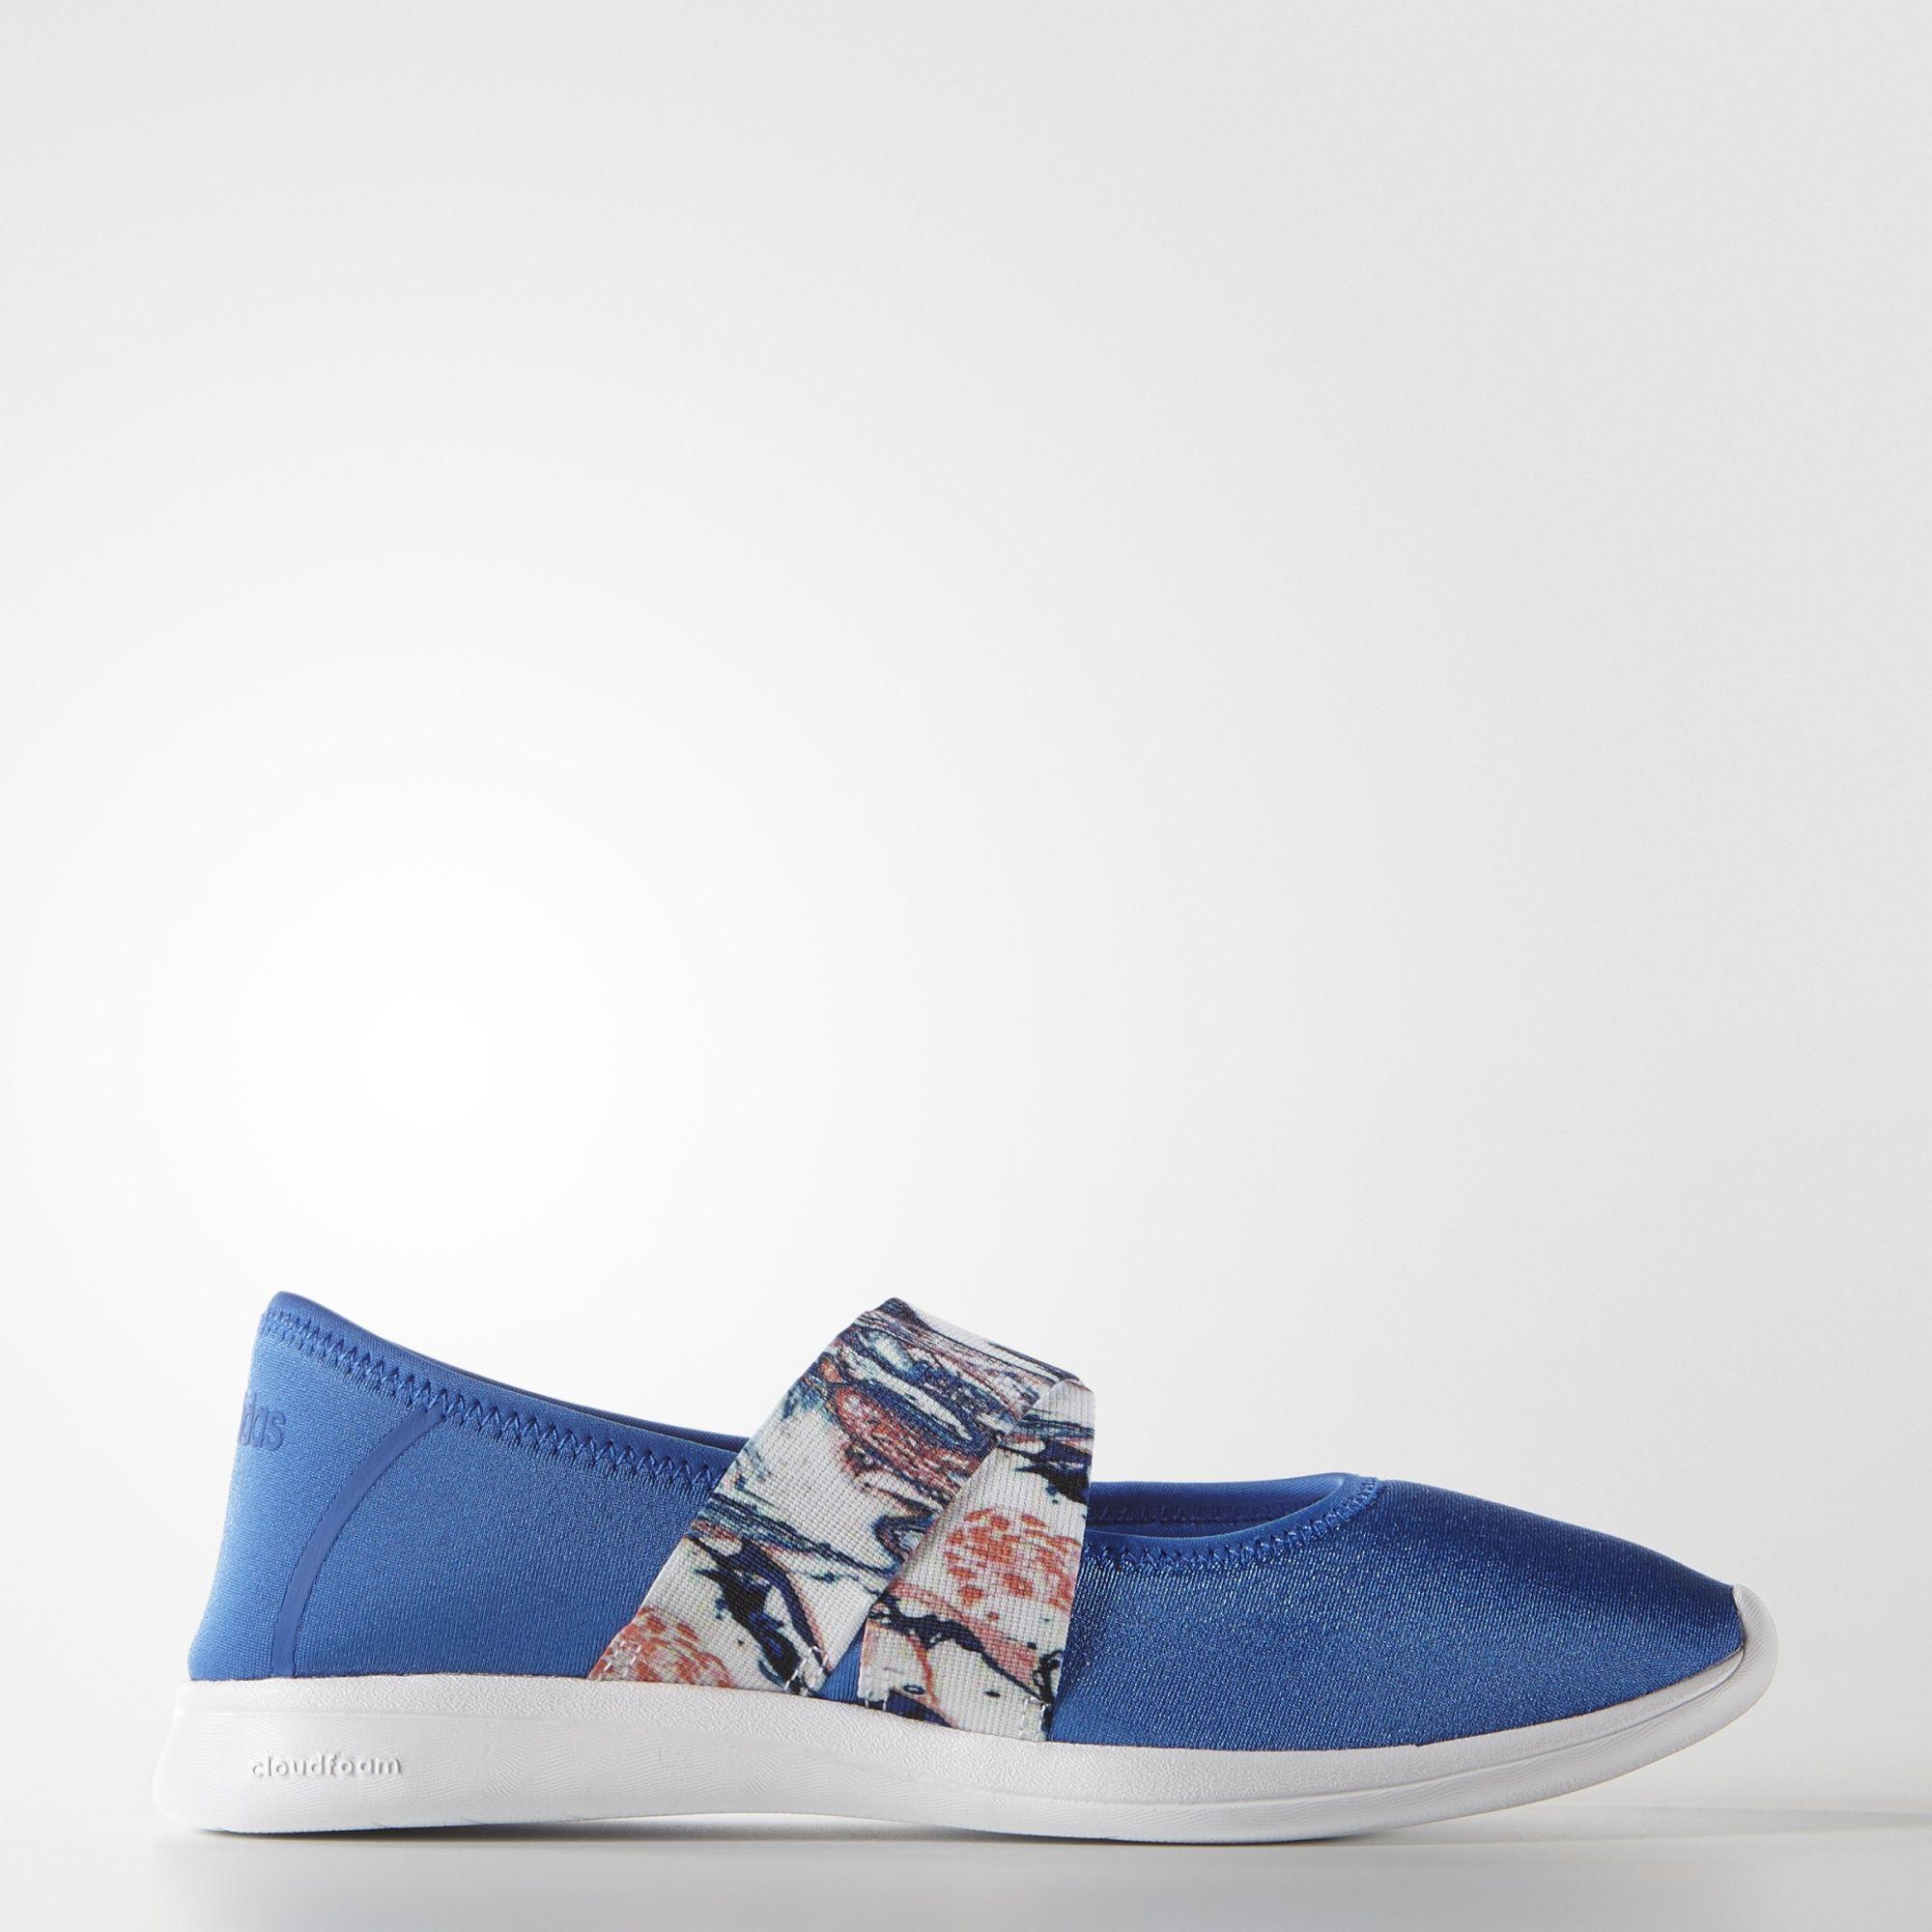 adidas cloudfoam puro mary jane scarpe adidas noi blu moda